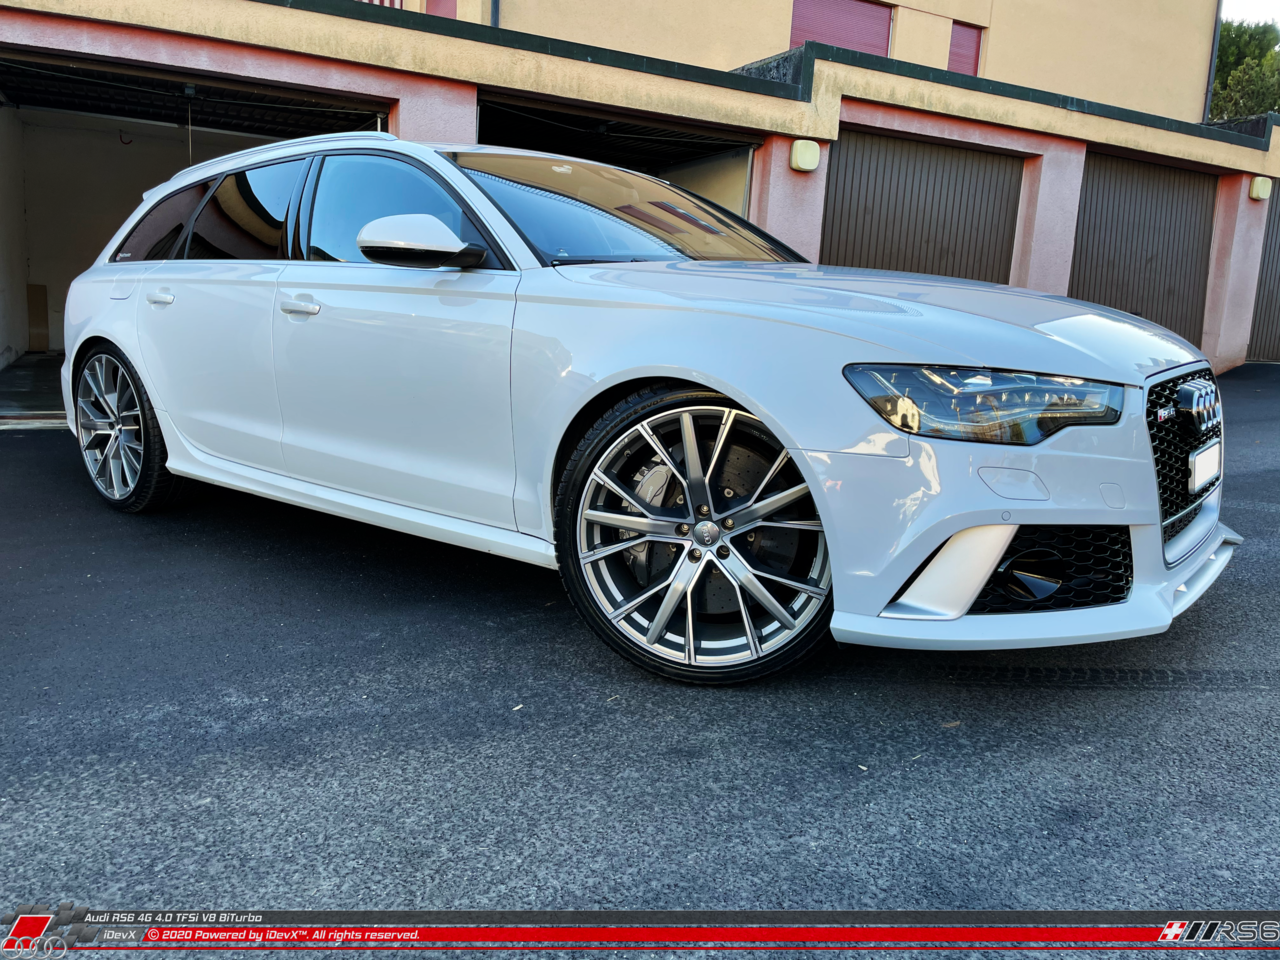 21.02.2021_Audi-RS6_iDevX_002.png